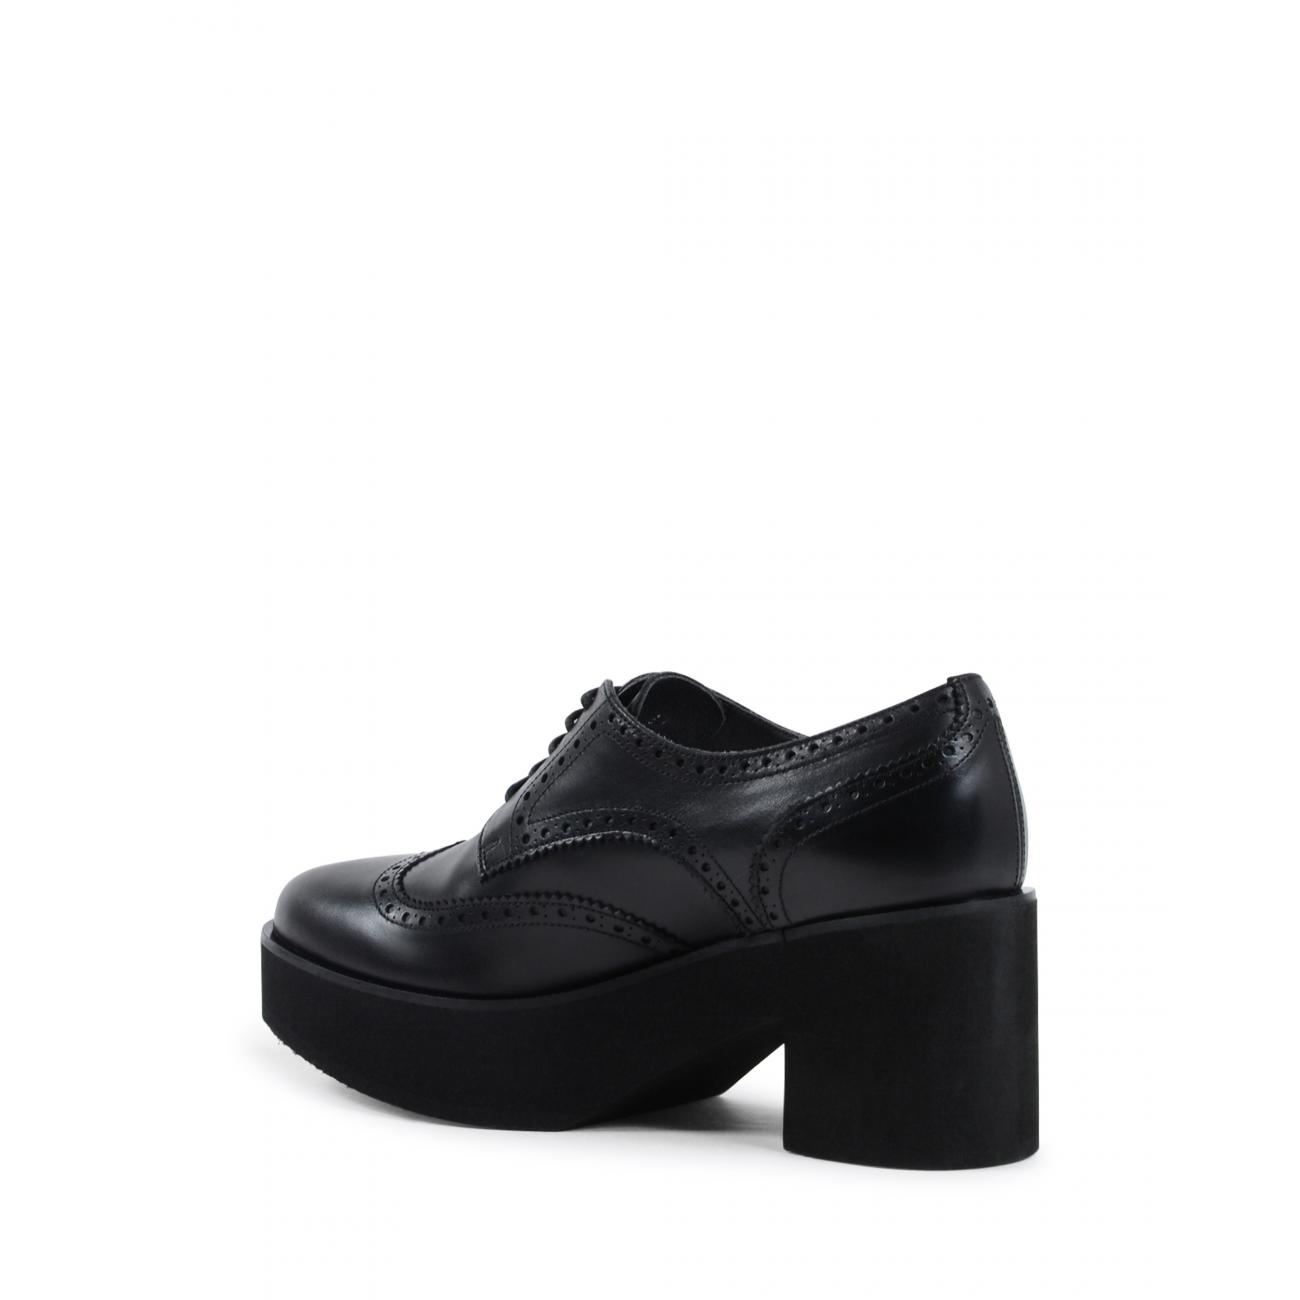 Fratelli Rossetti Womens Brogue Shoe Black 75438 VELVETY NERO